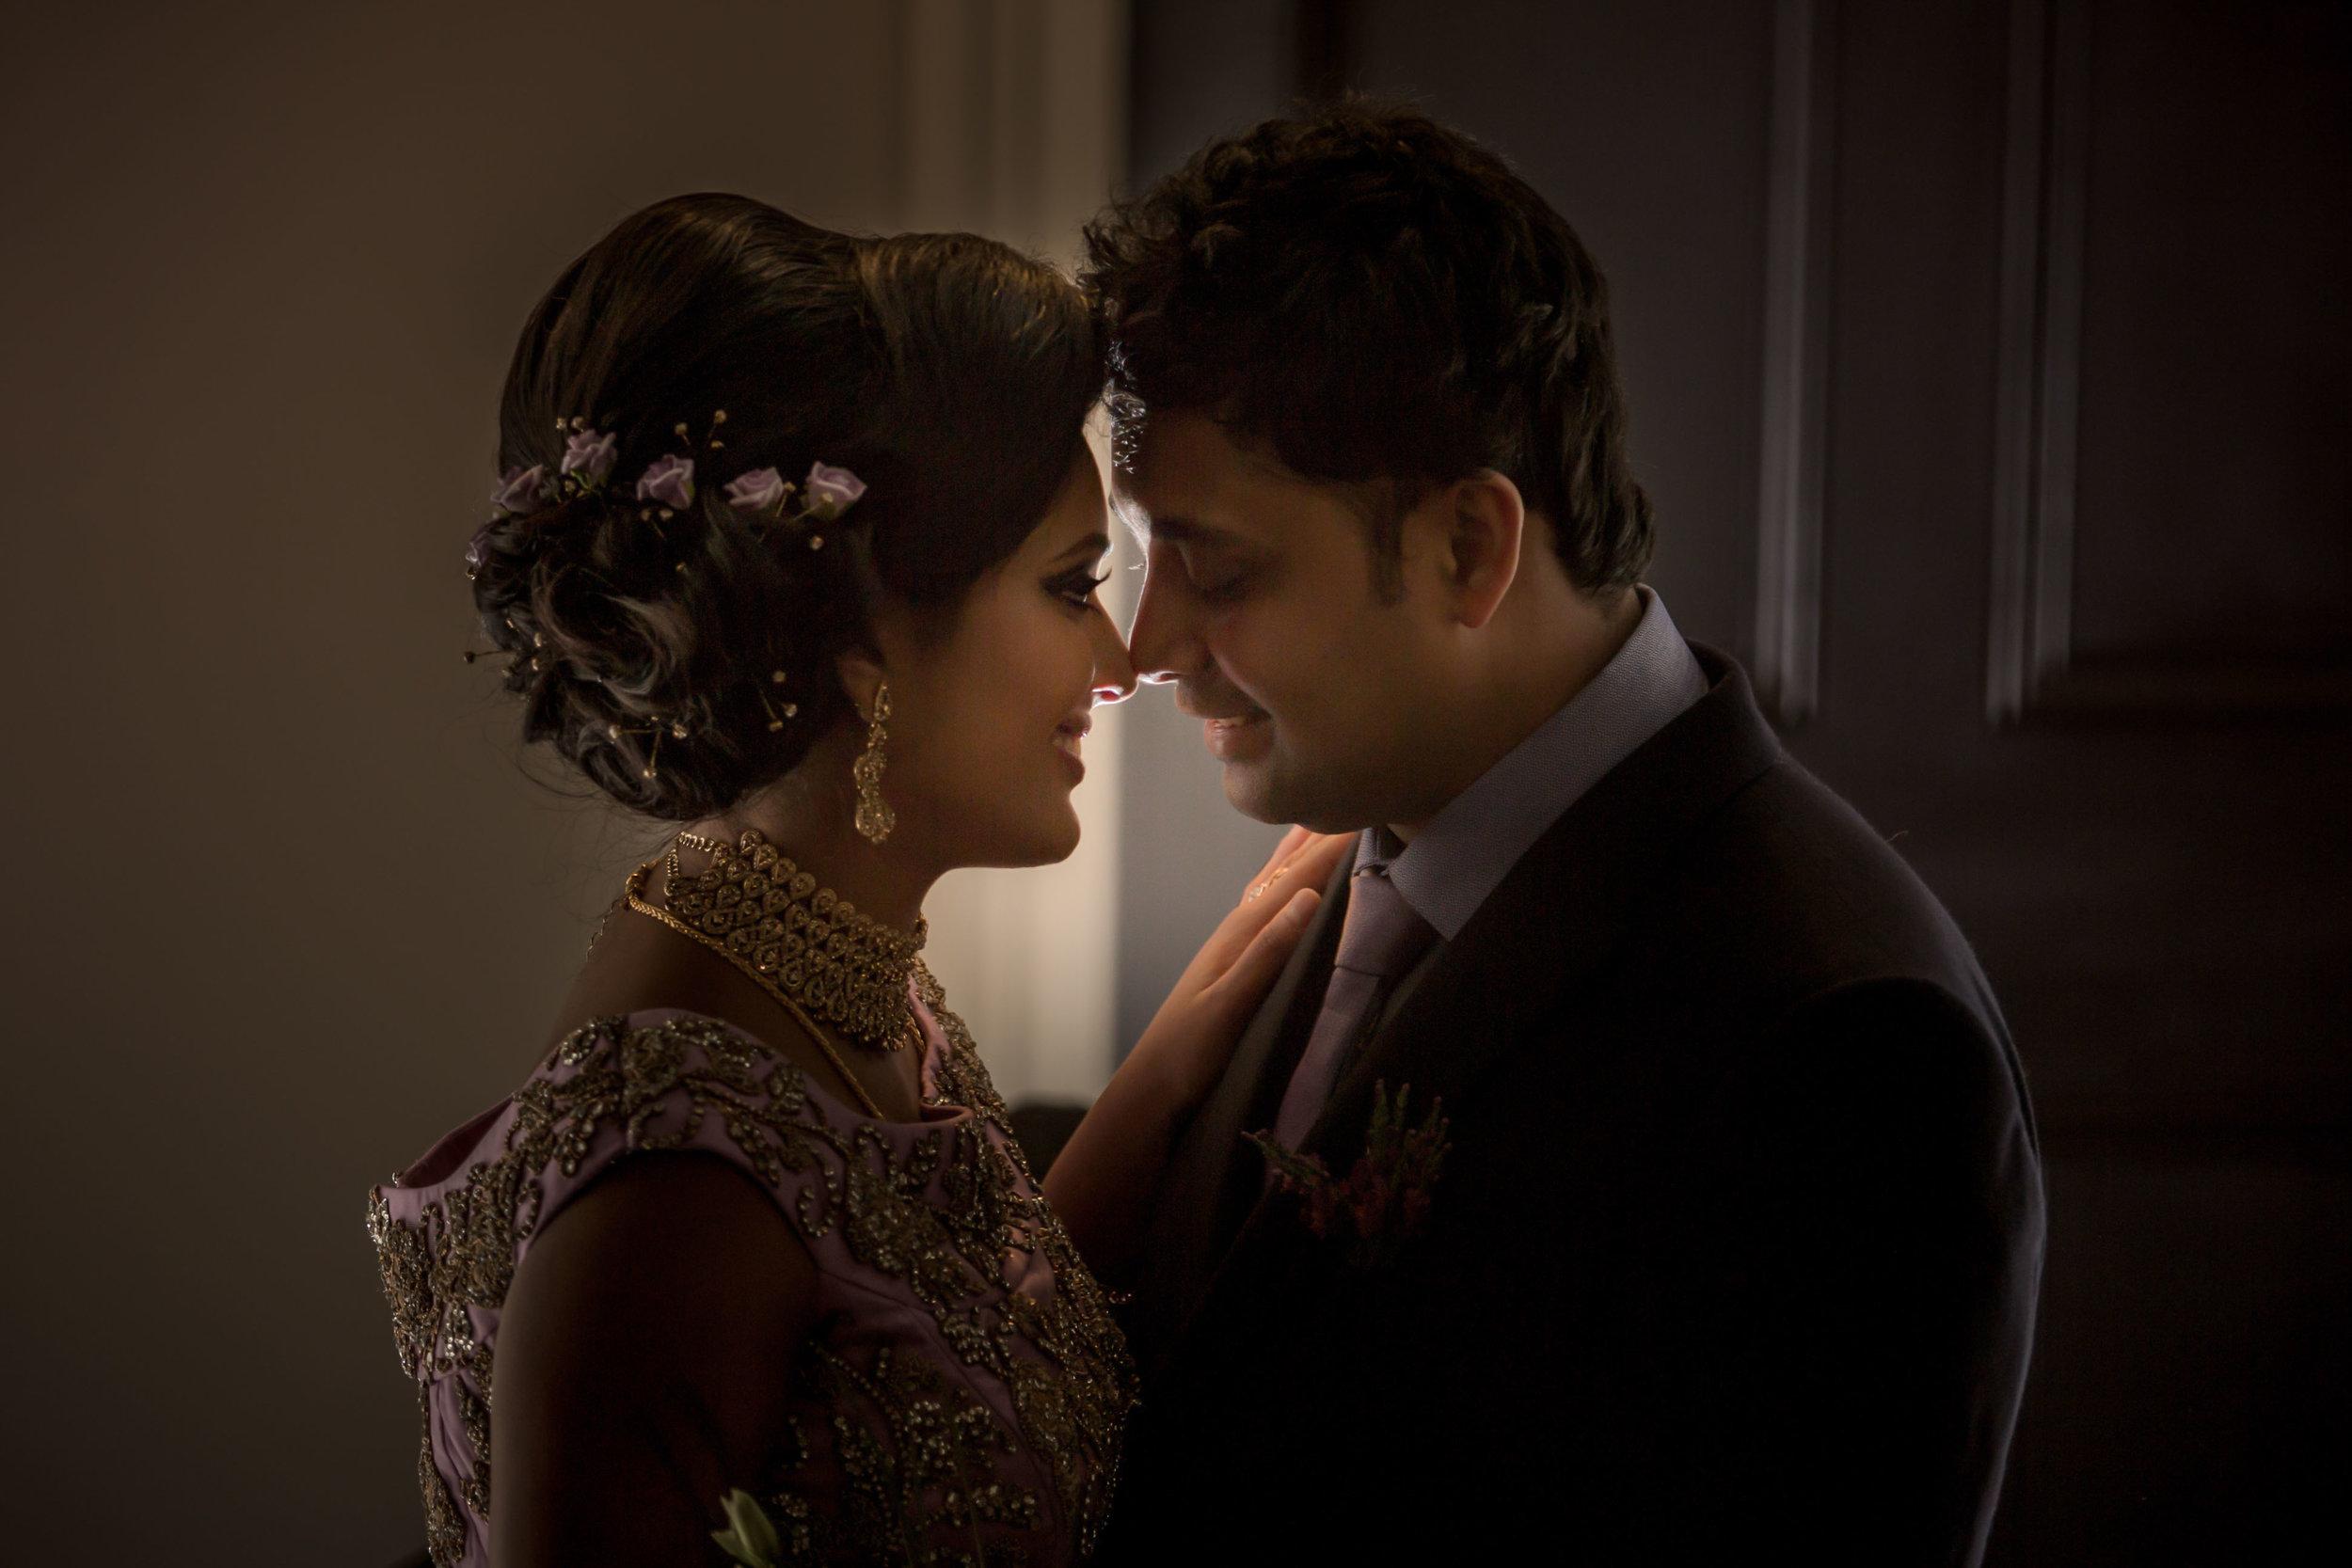 Andaz-London-Liverpool-Street-Hindu-Wedding-Photographer-London-14.jpg